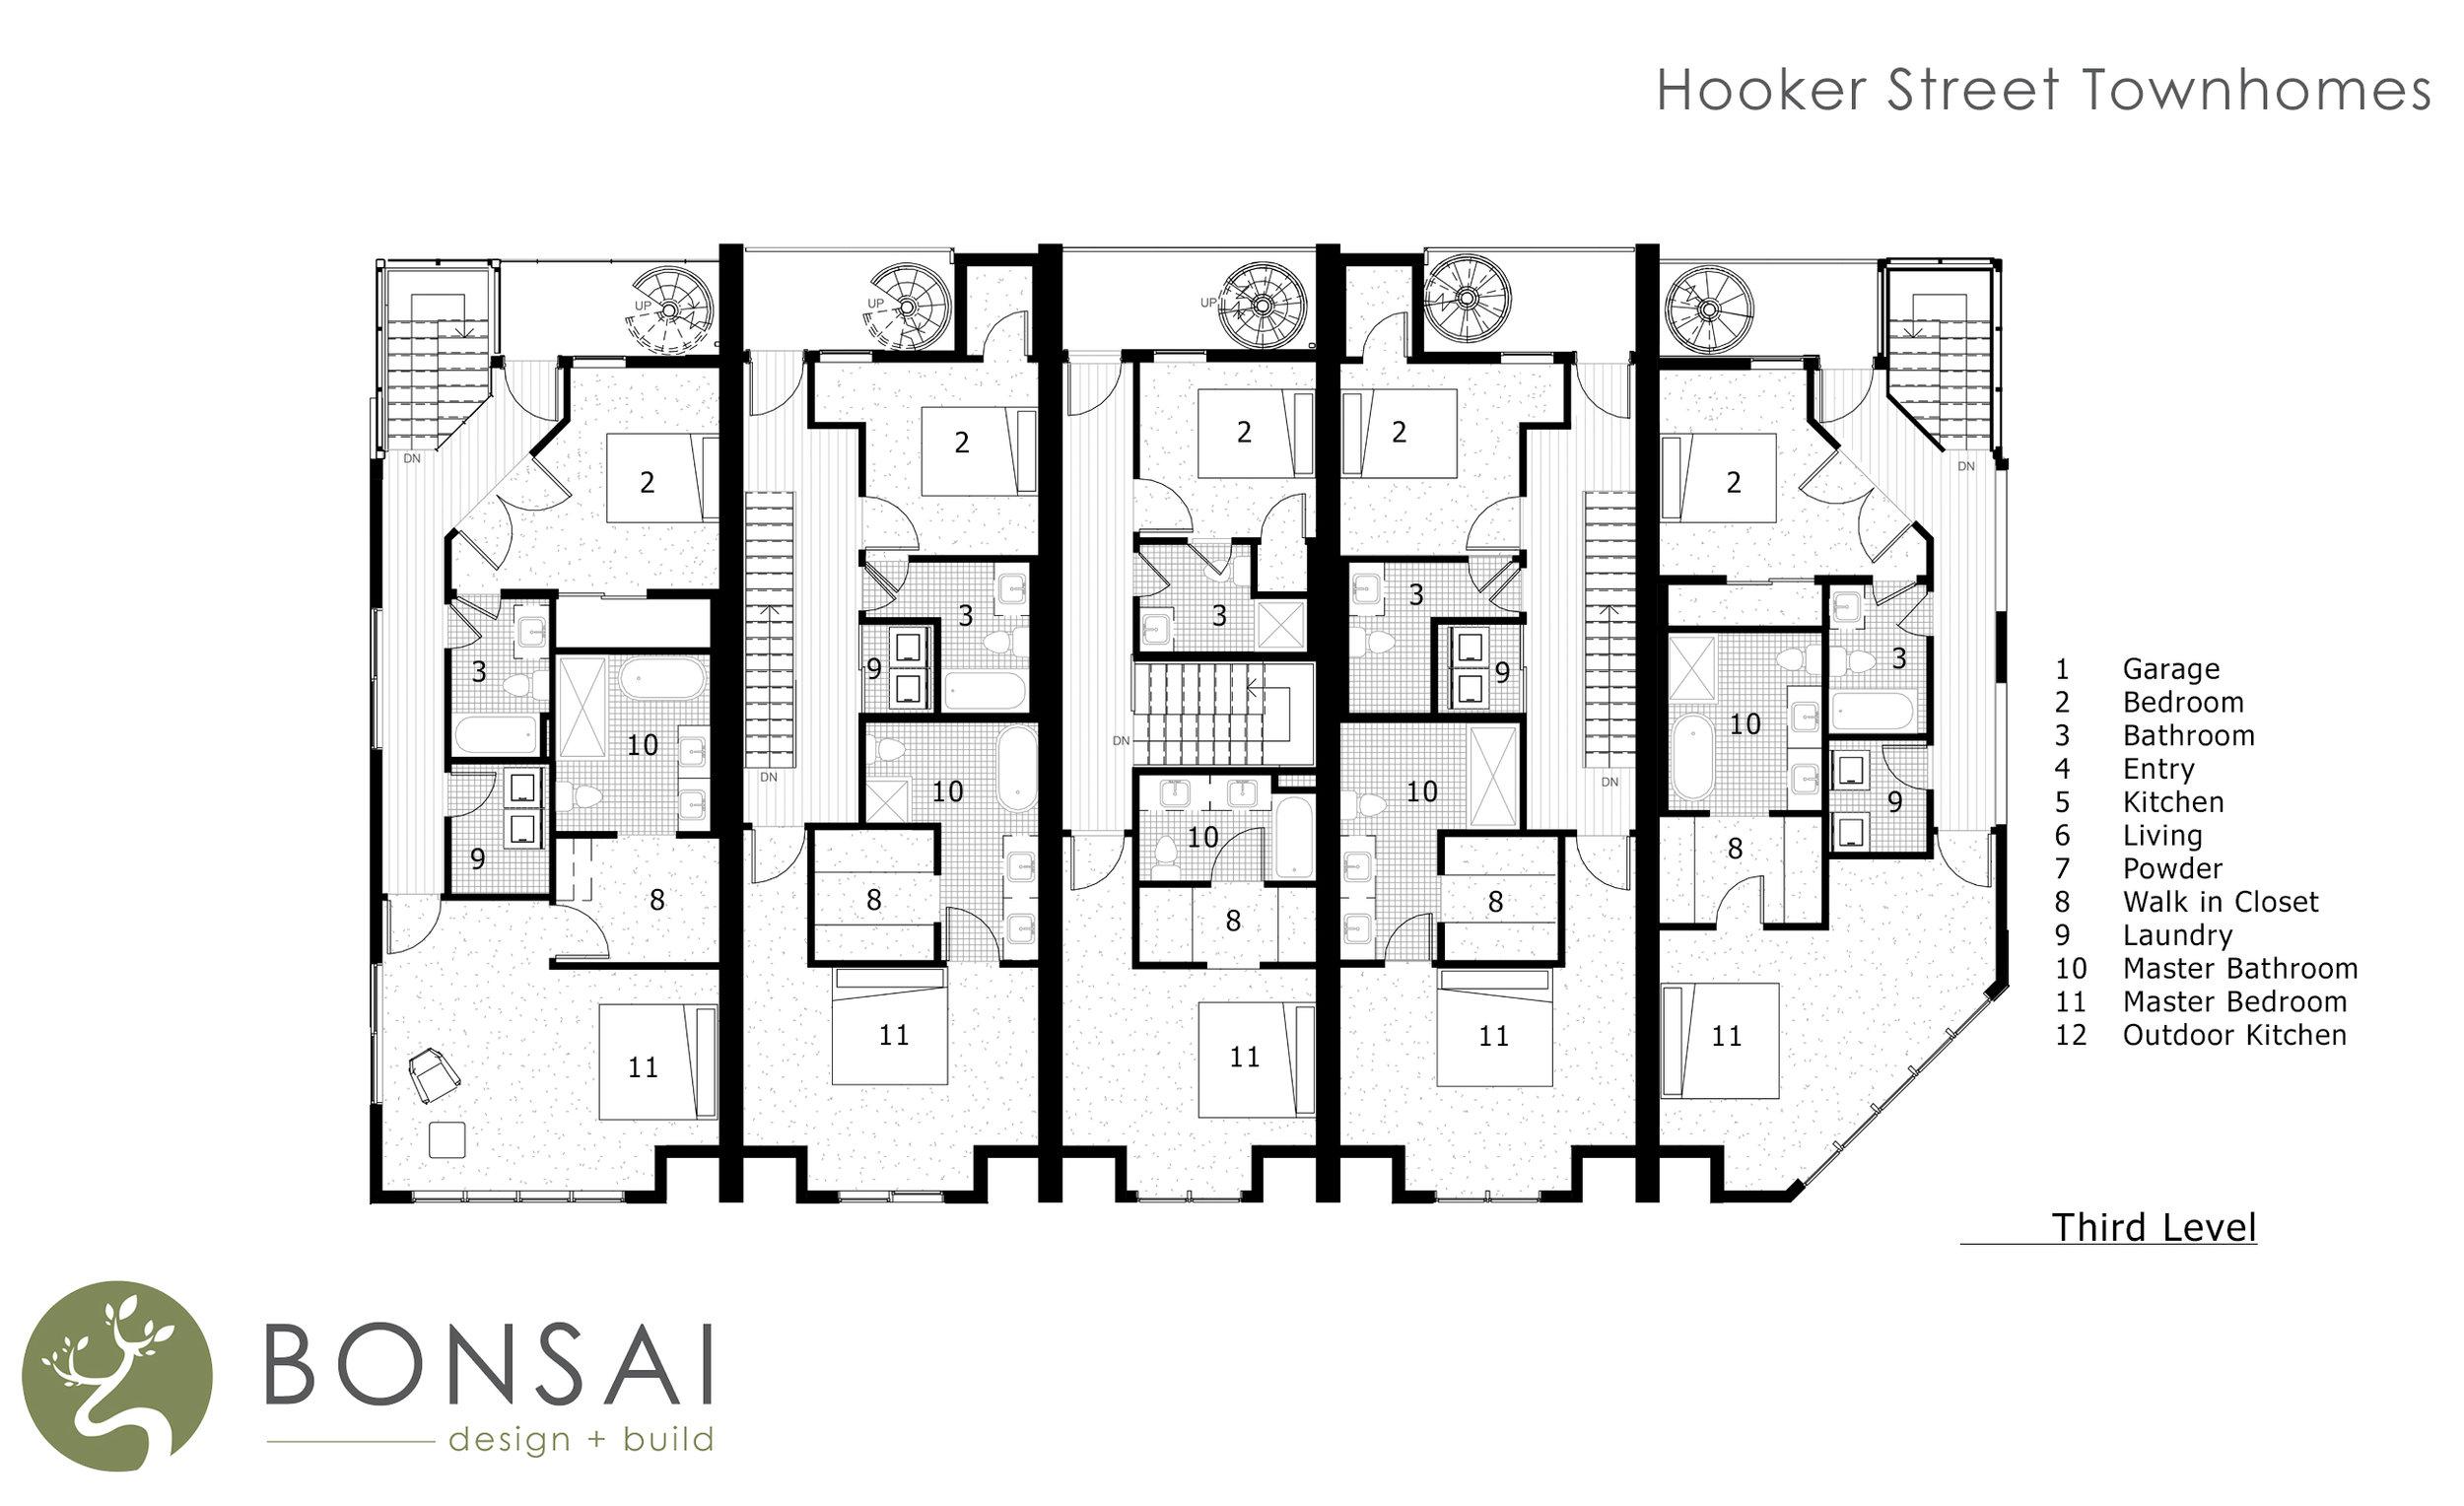 Hooker St Townhomes Third Level Plan.jpg